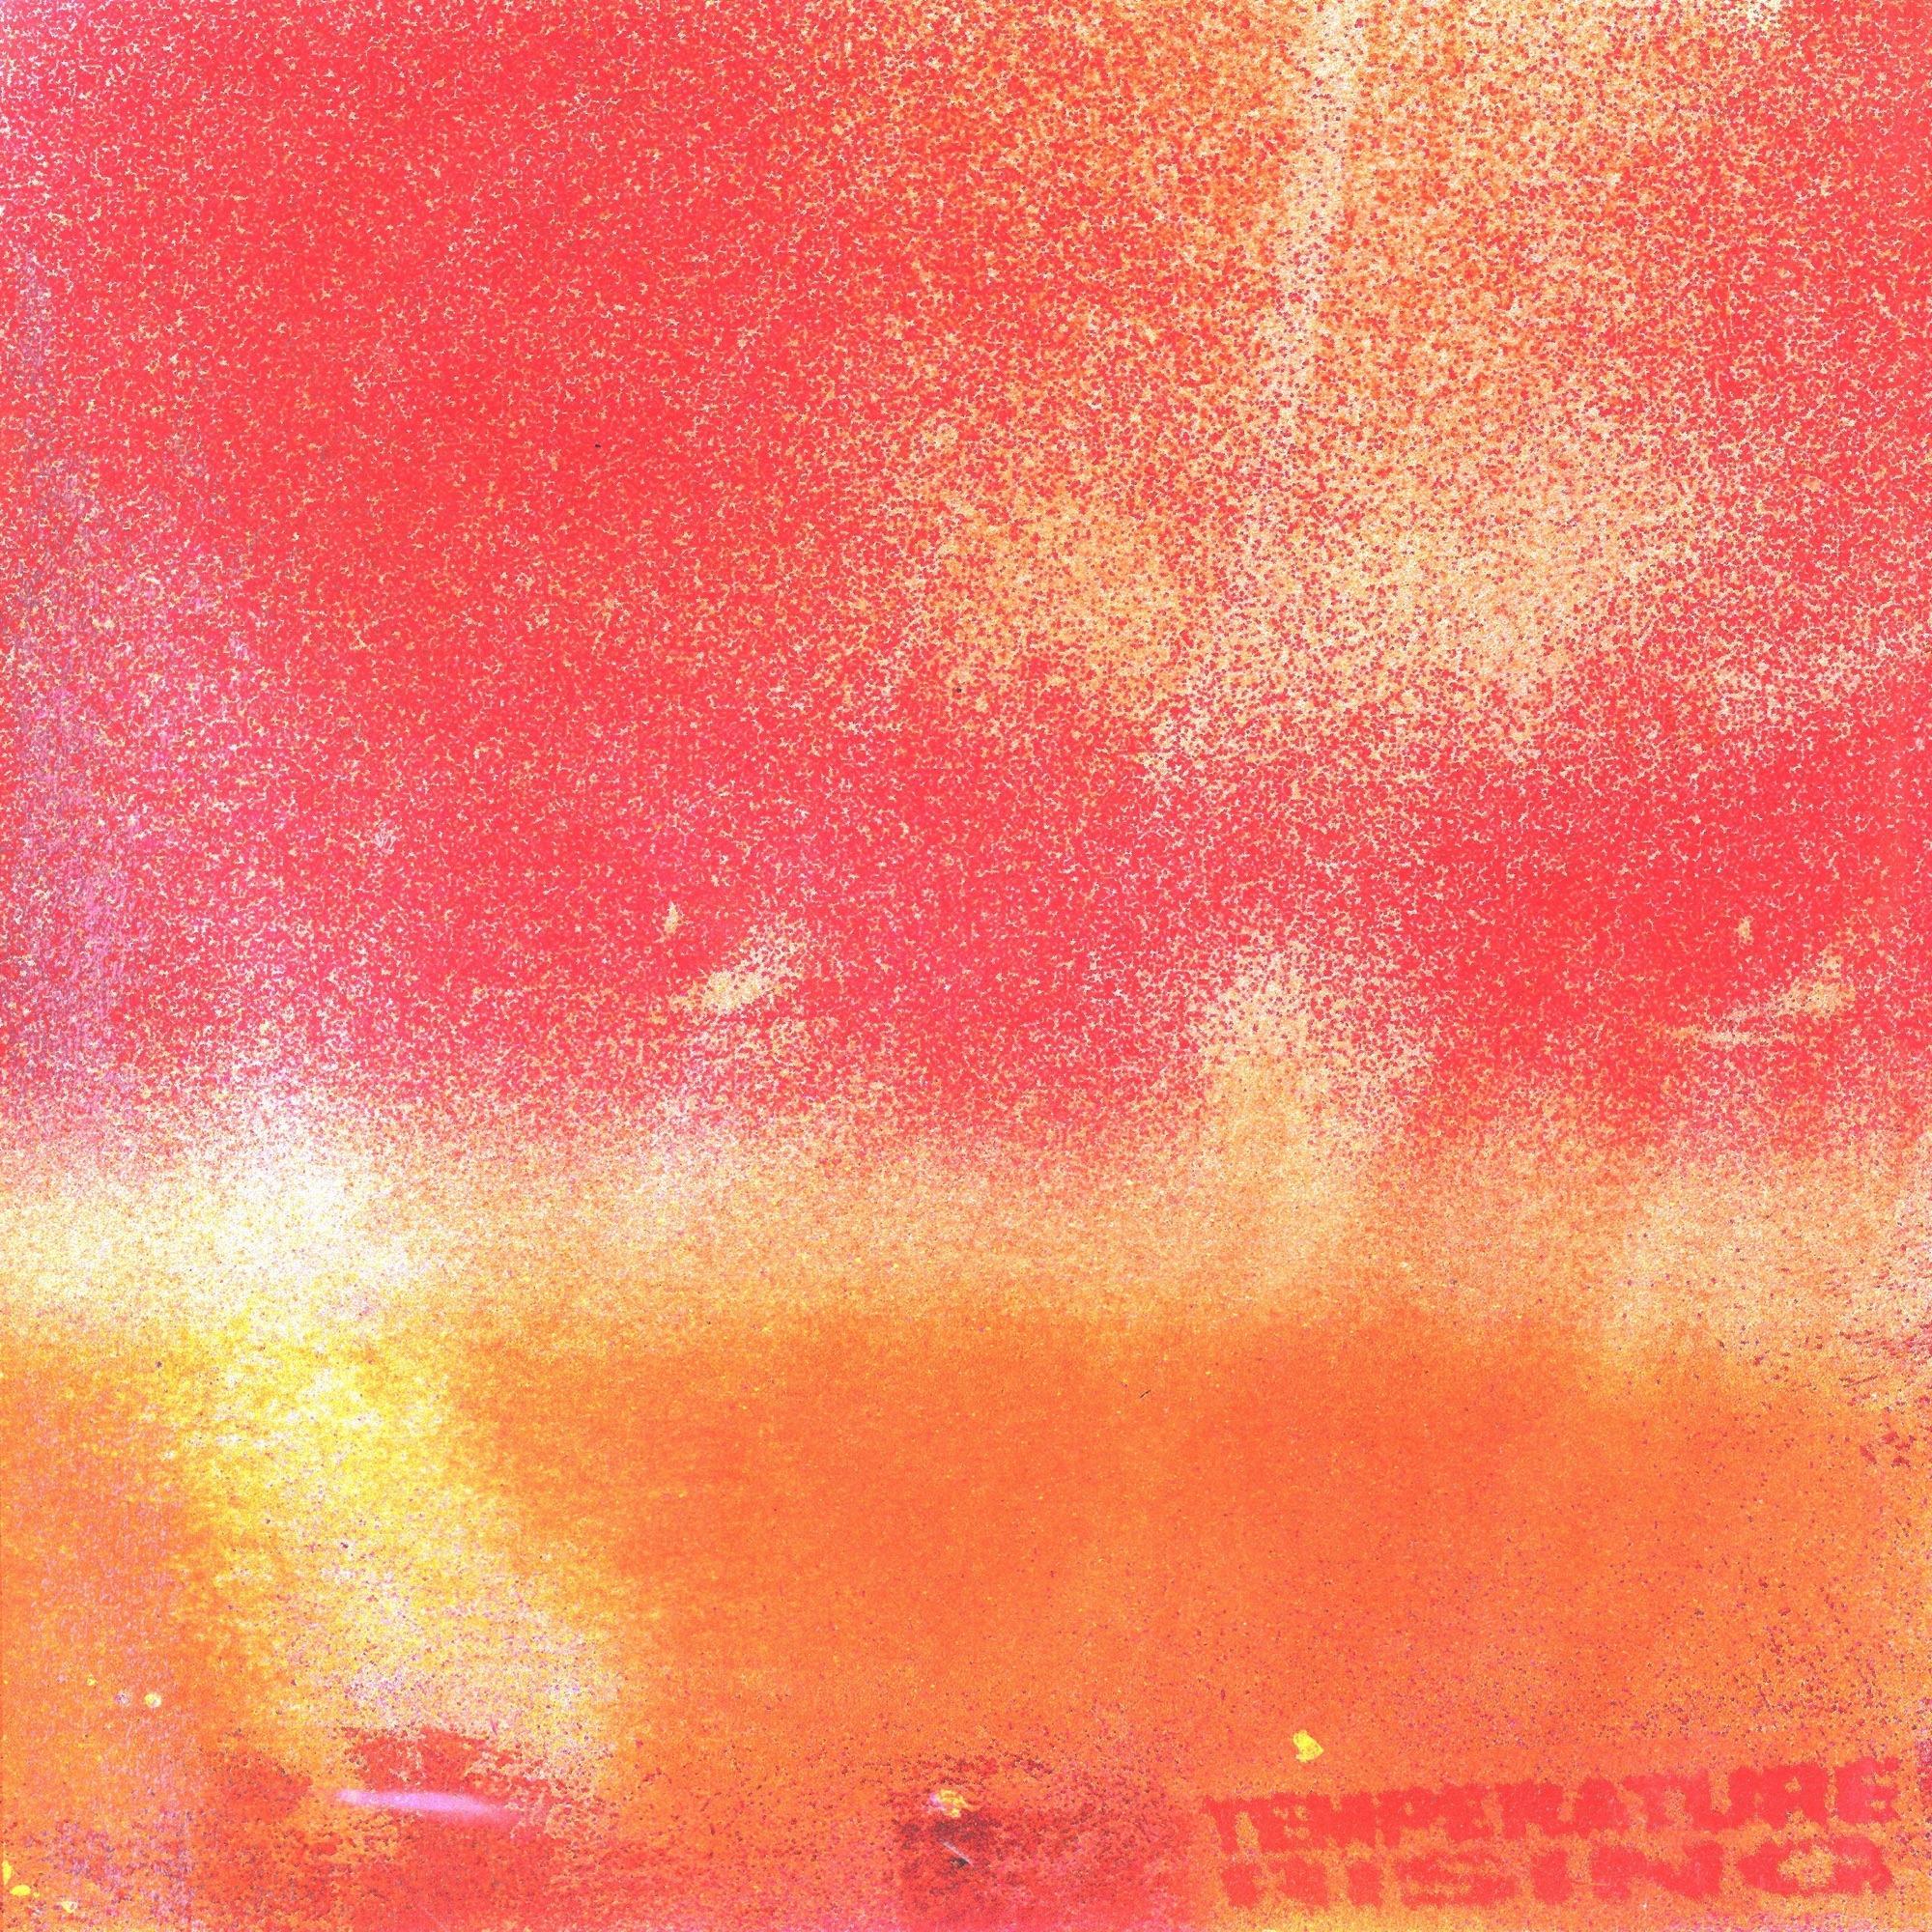 Tory Lanez – Temperature Rising